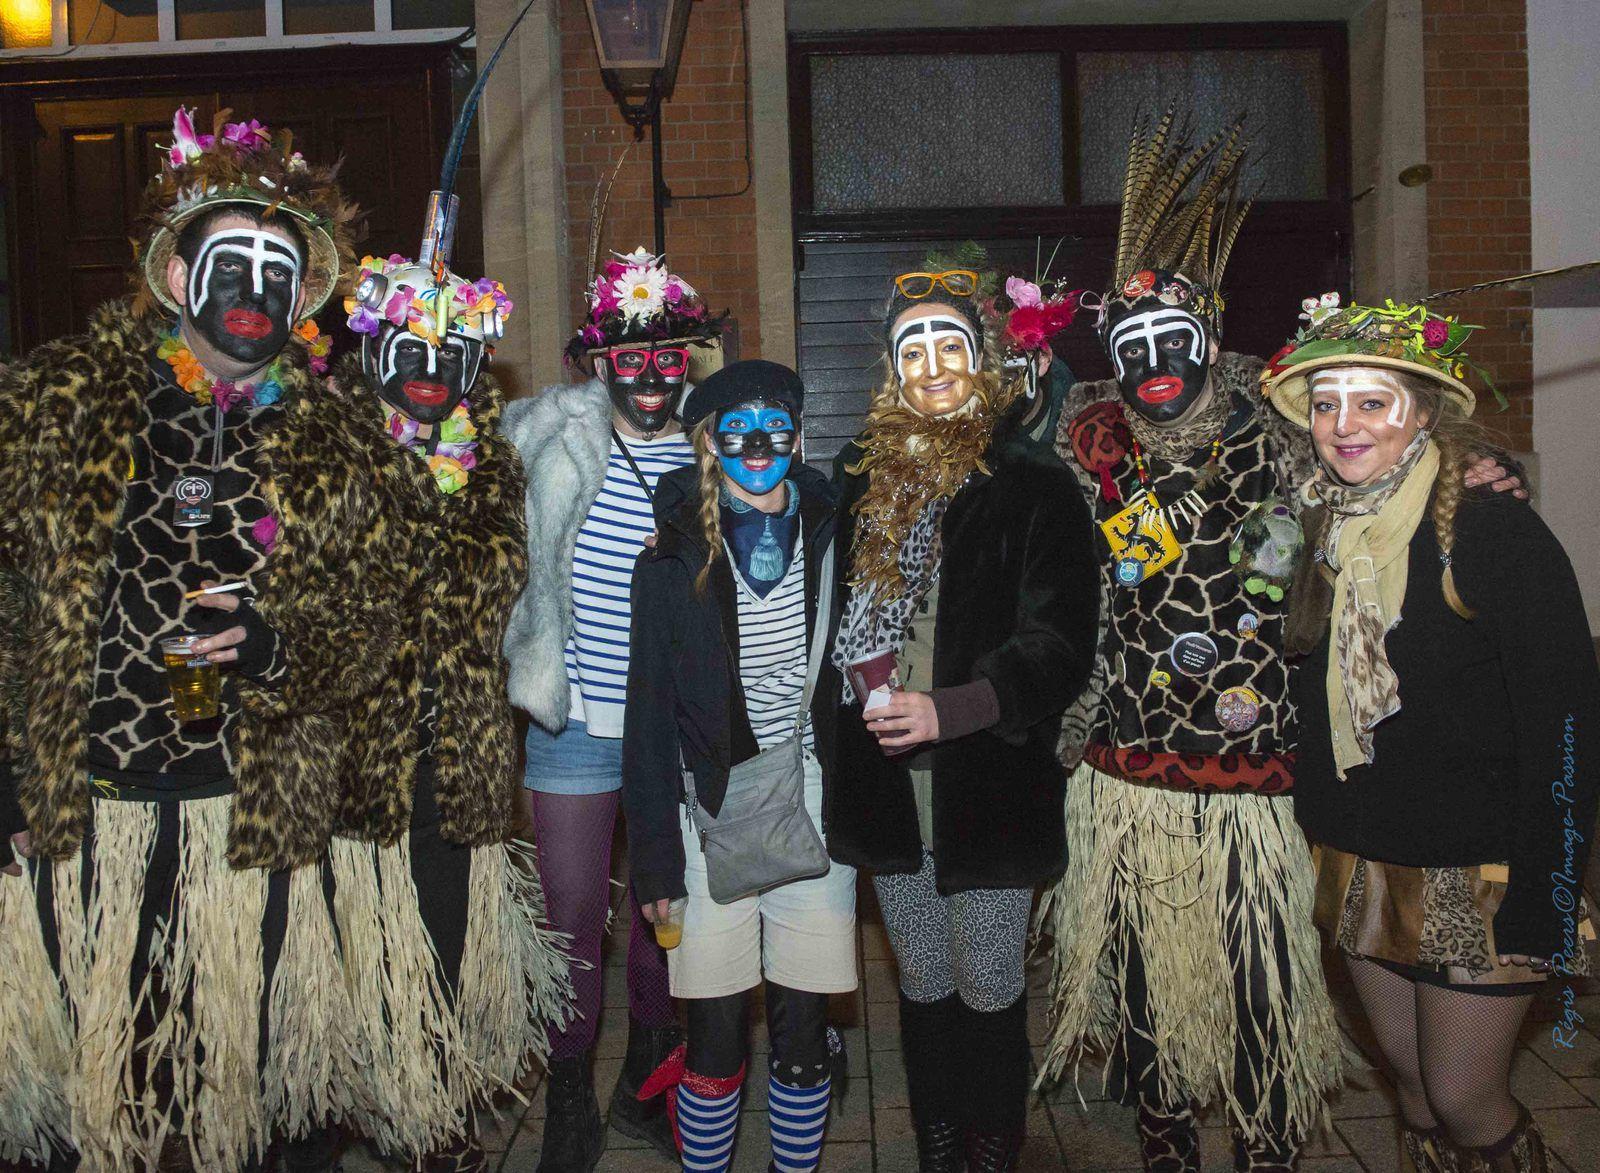 Carnaval de Dunkerque 2016 Bande de la Citadelle